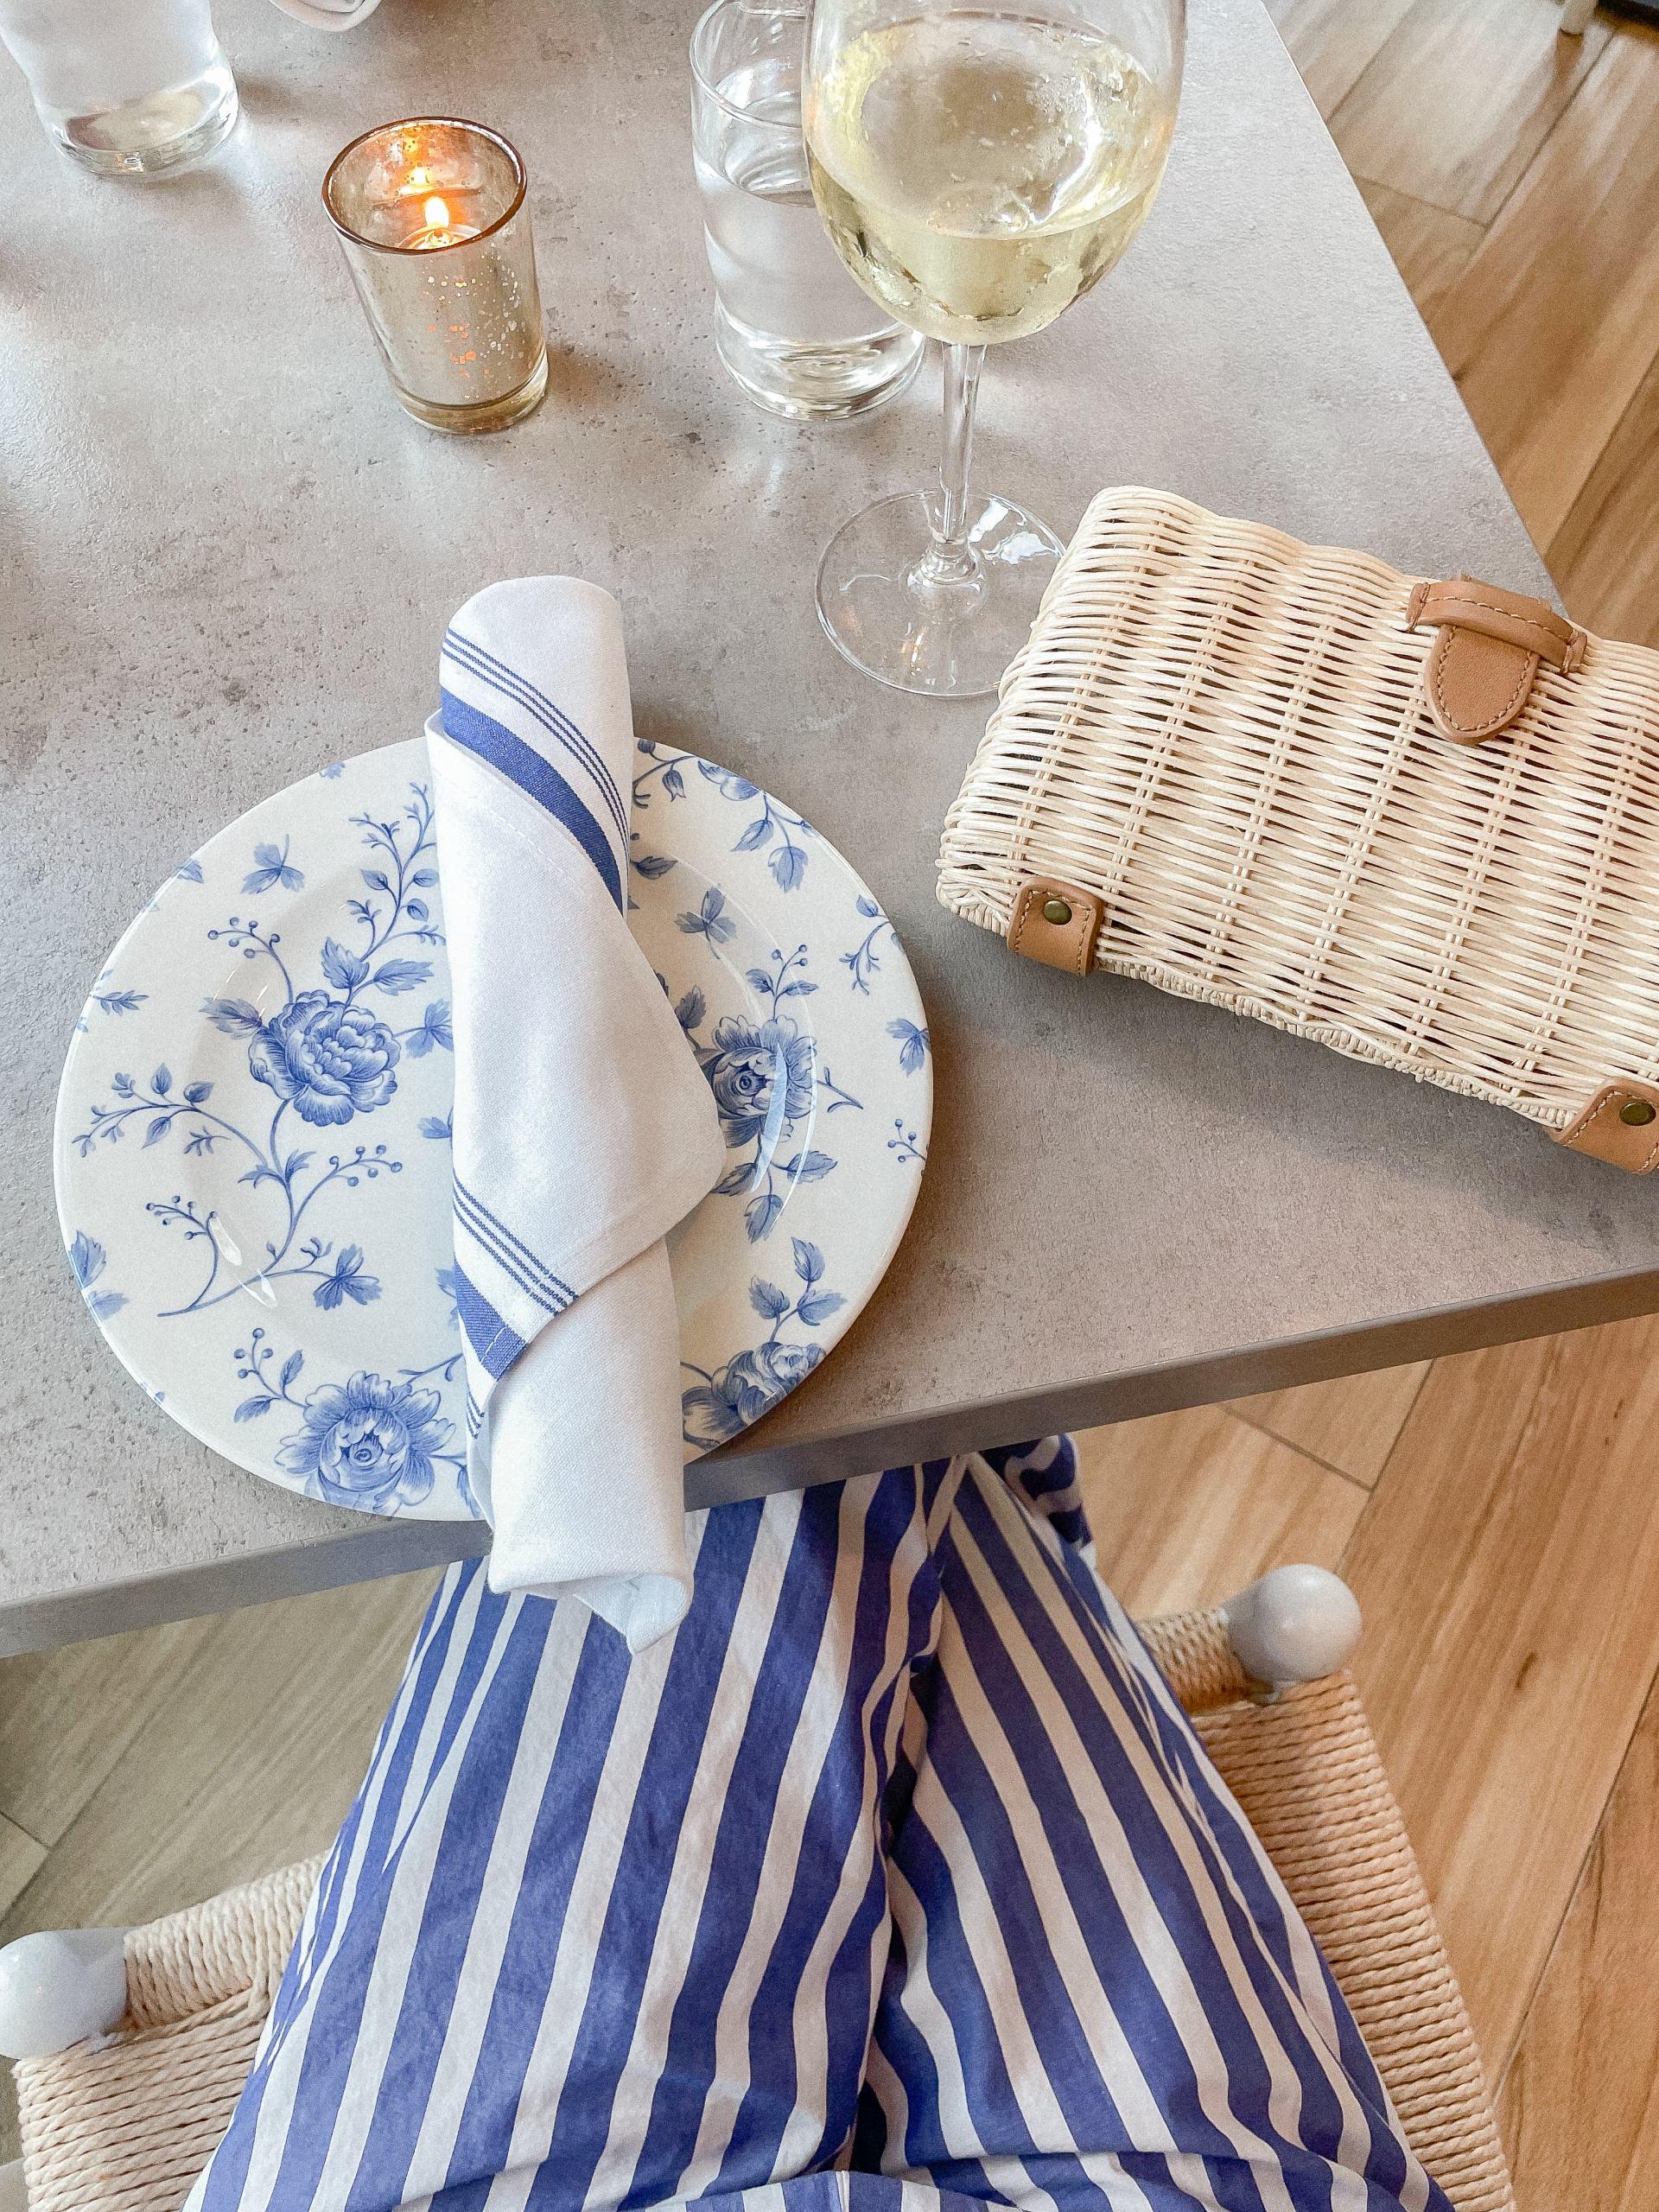 baha mar cleo restaurant - restaurants in nassau - rattan clutch